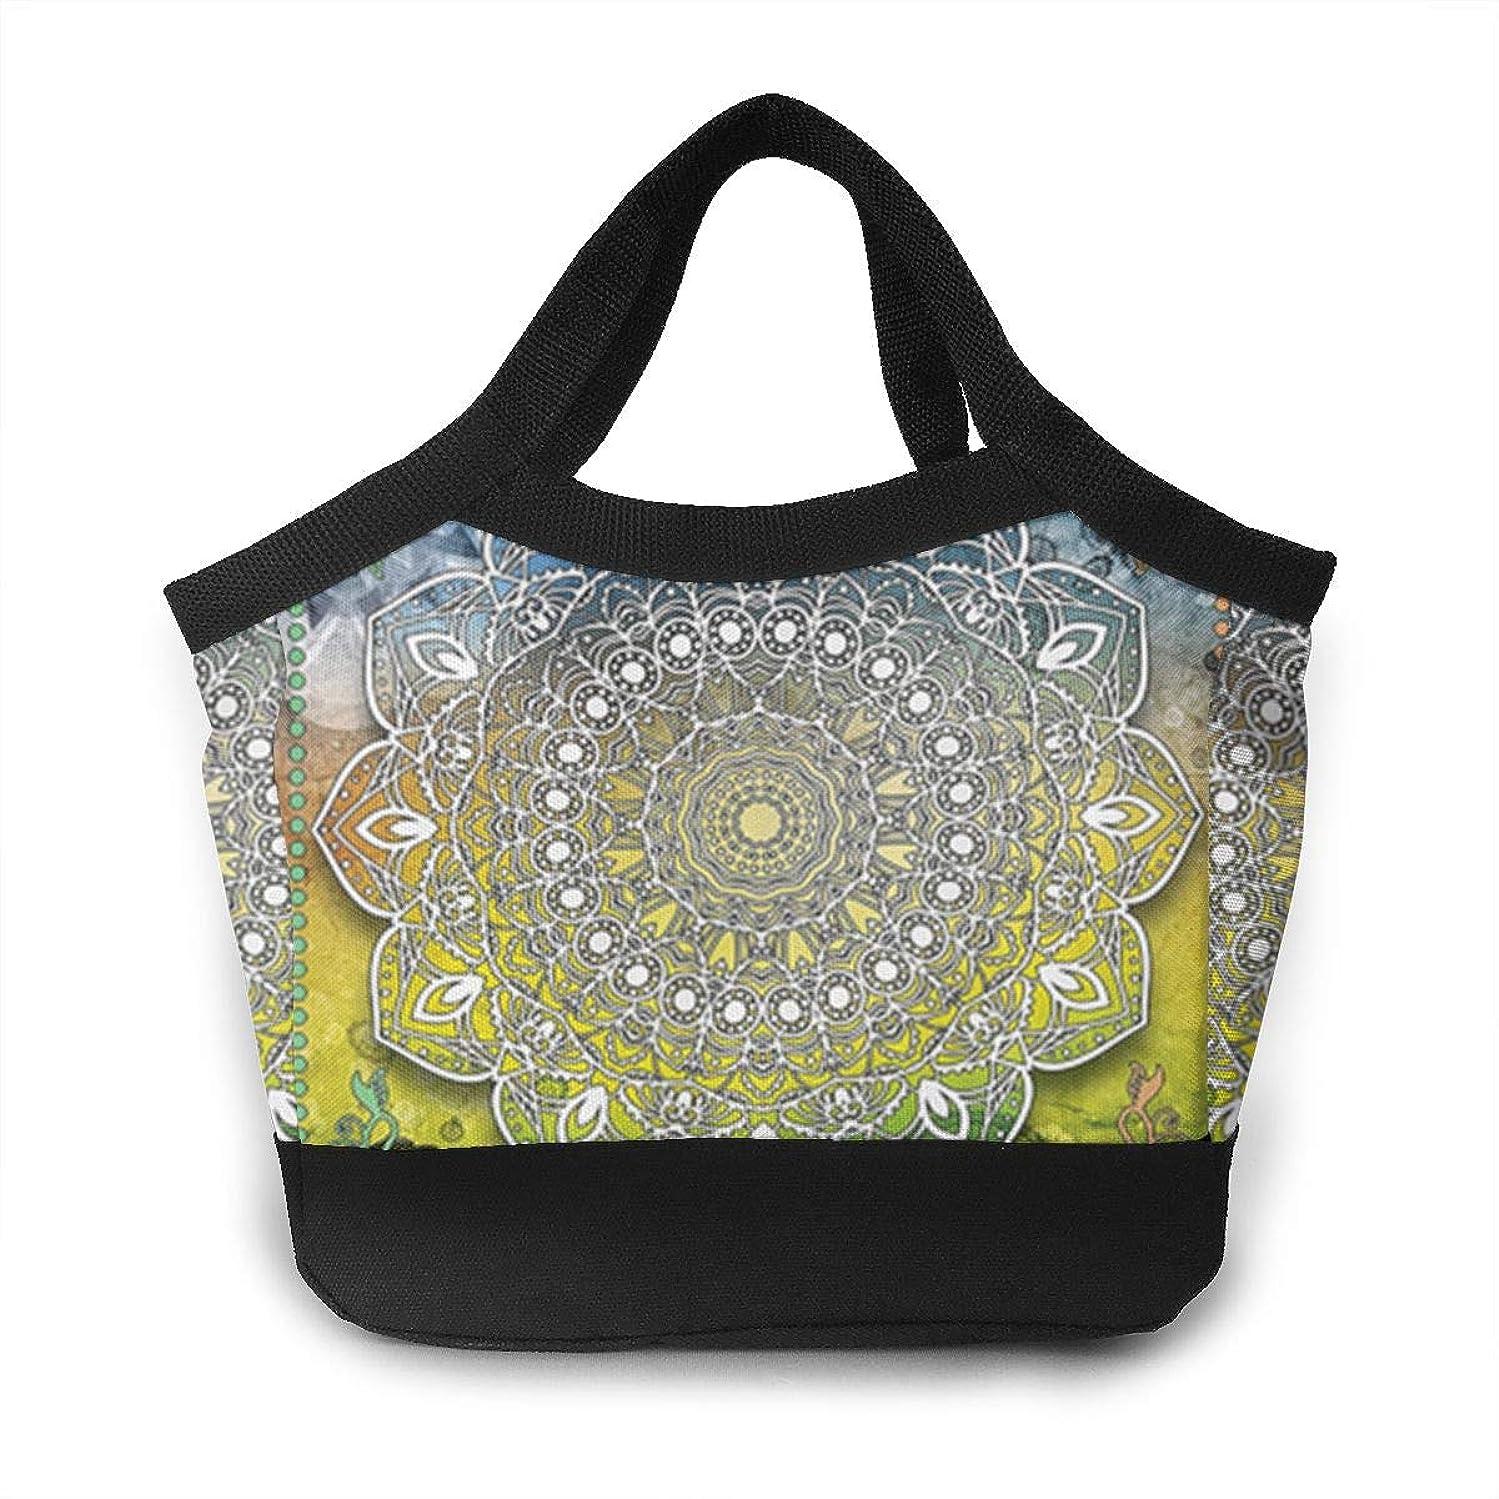 JHNDKJS Mystic Asian Mandala Zen Culture Lunch Bag Insulated Lunch Box Cooler Bag for Women Men Adults Work